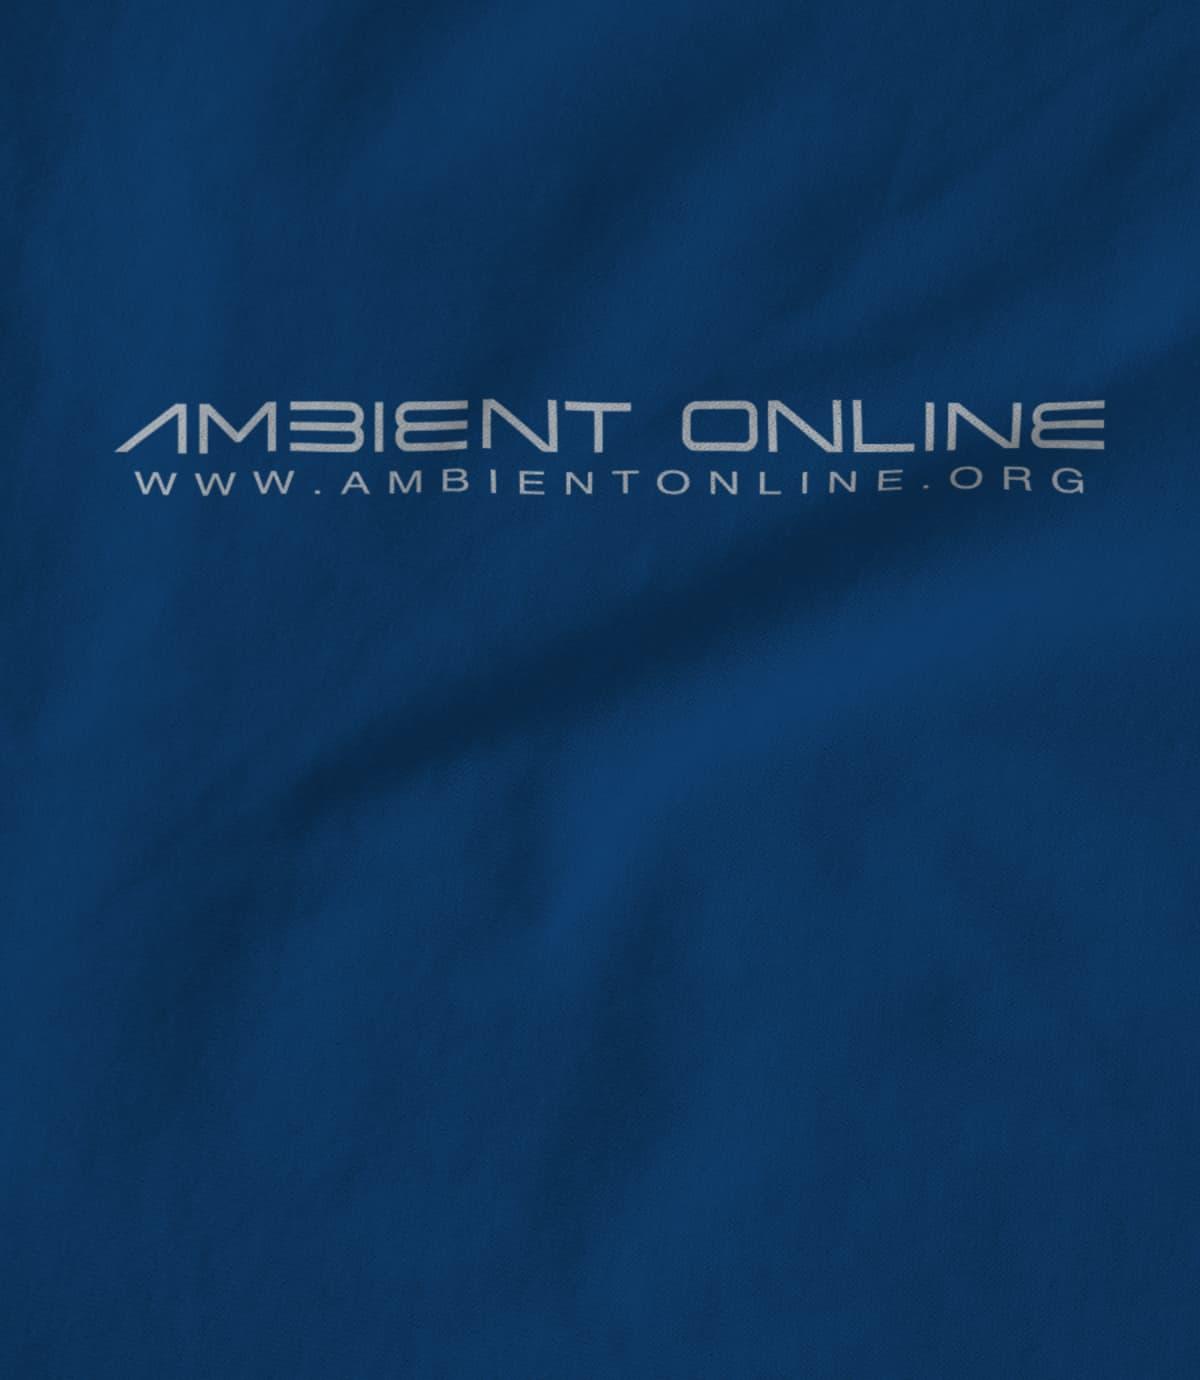 Ambient Online